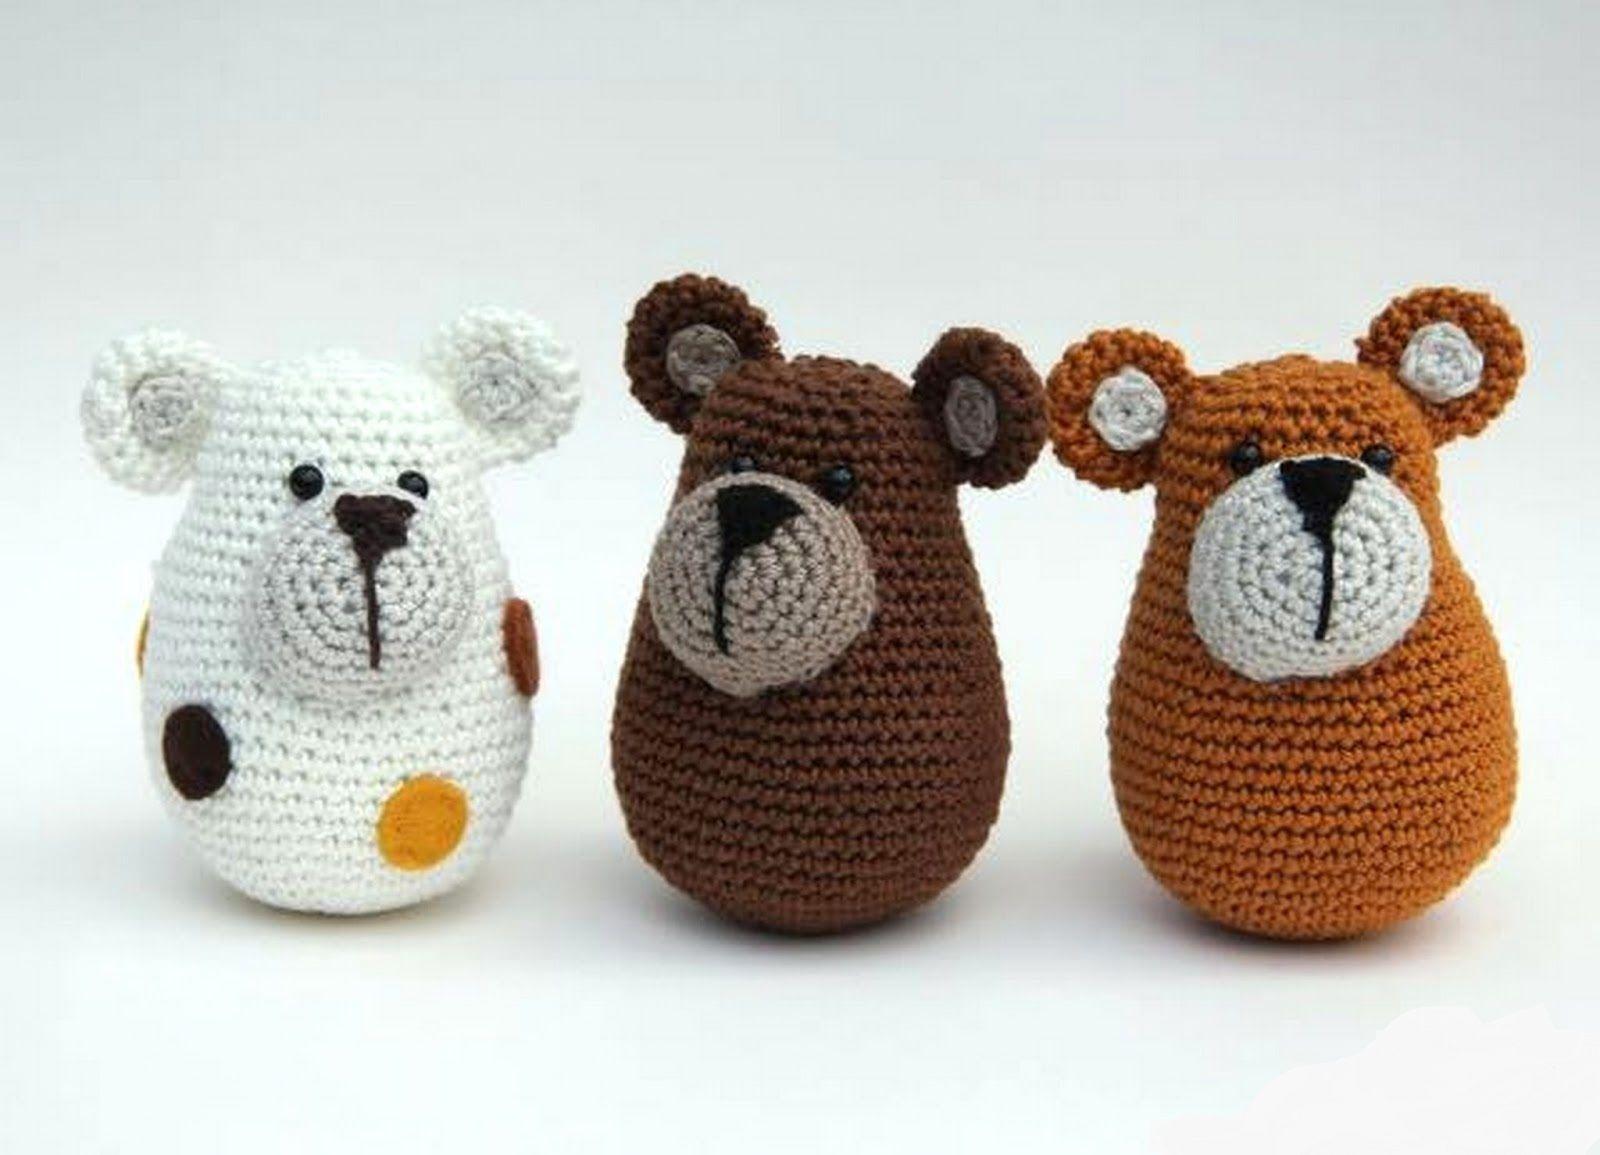 Pin de Marwa Omar en Crochet .. | Pinterest | Patrones amigurumi ...